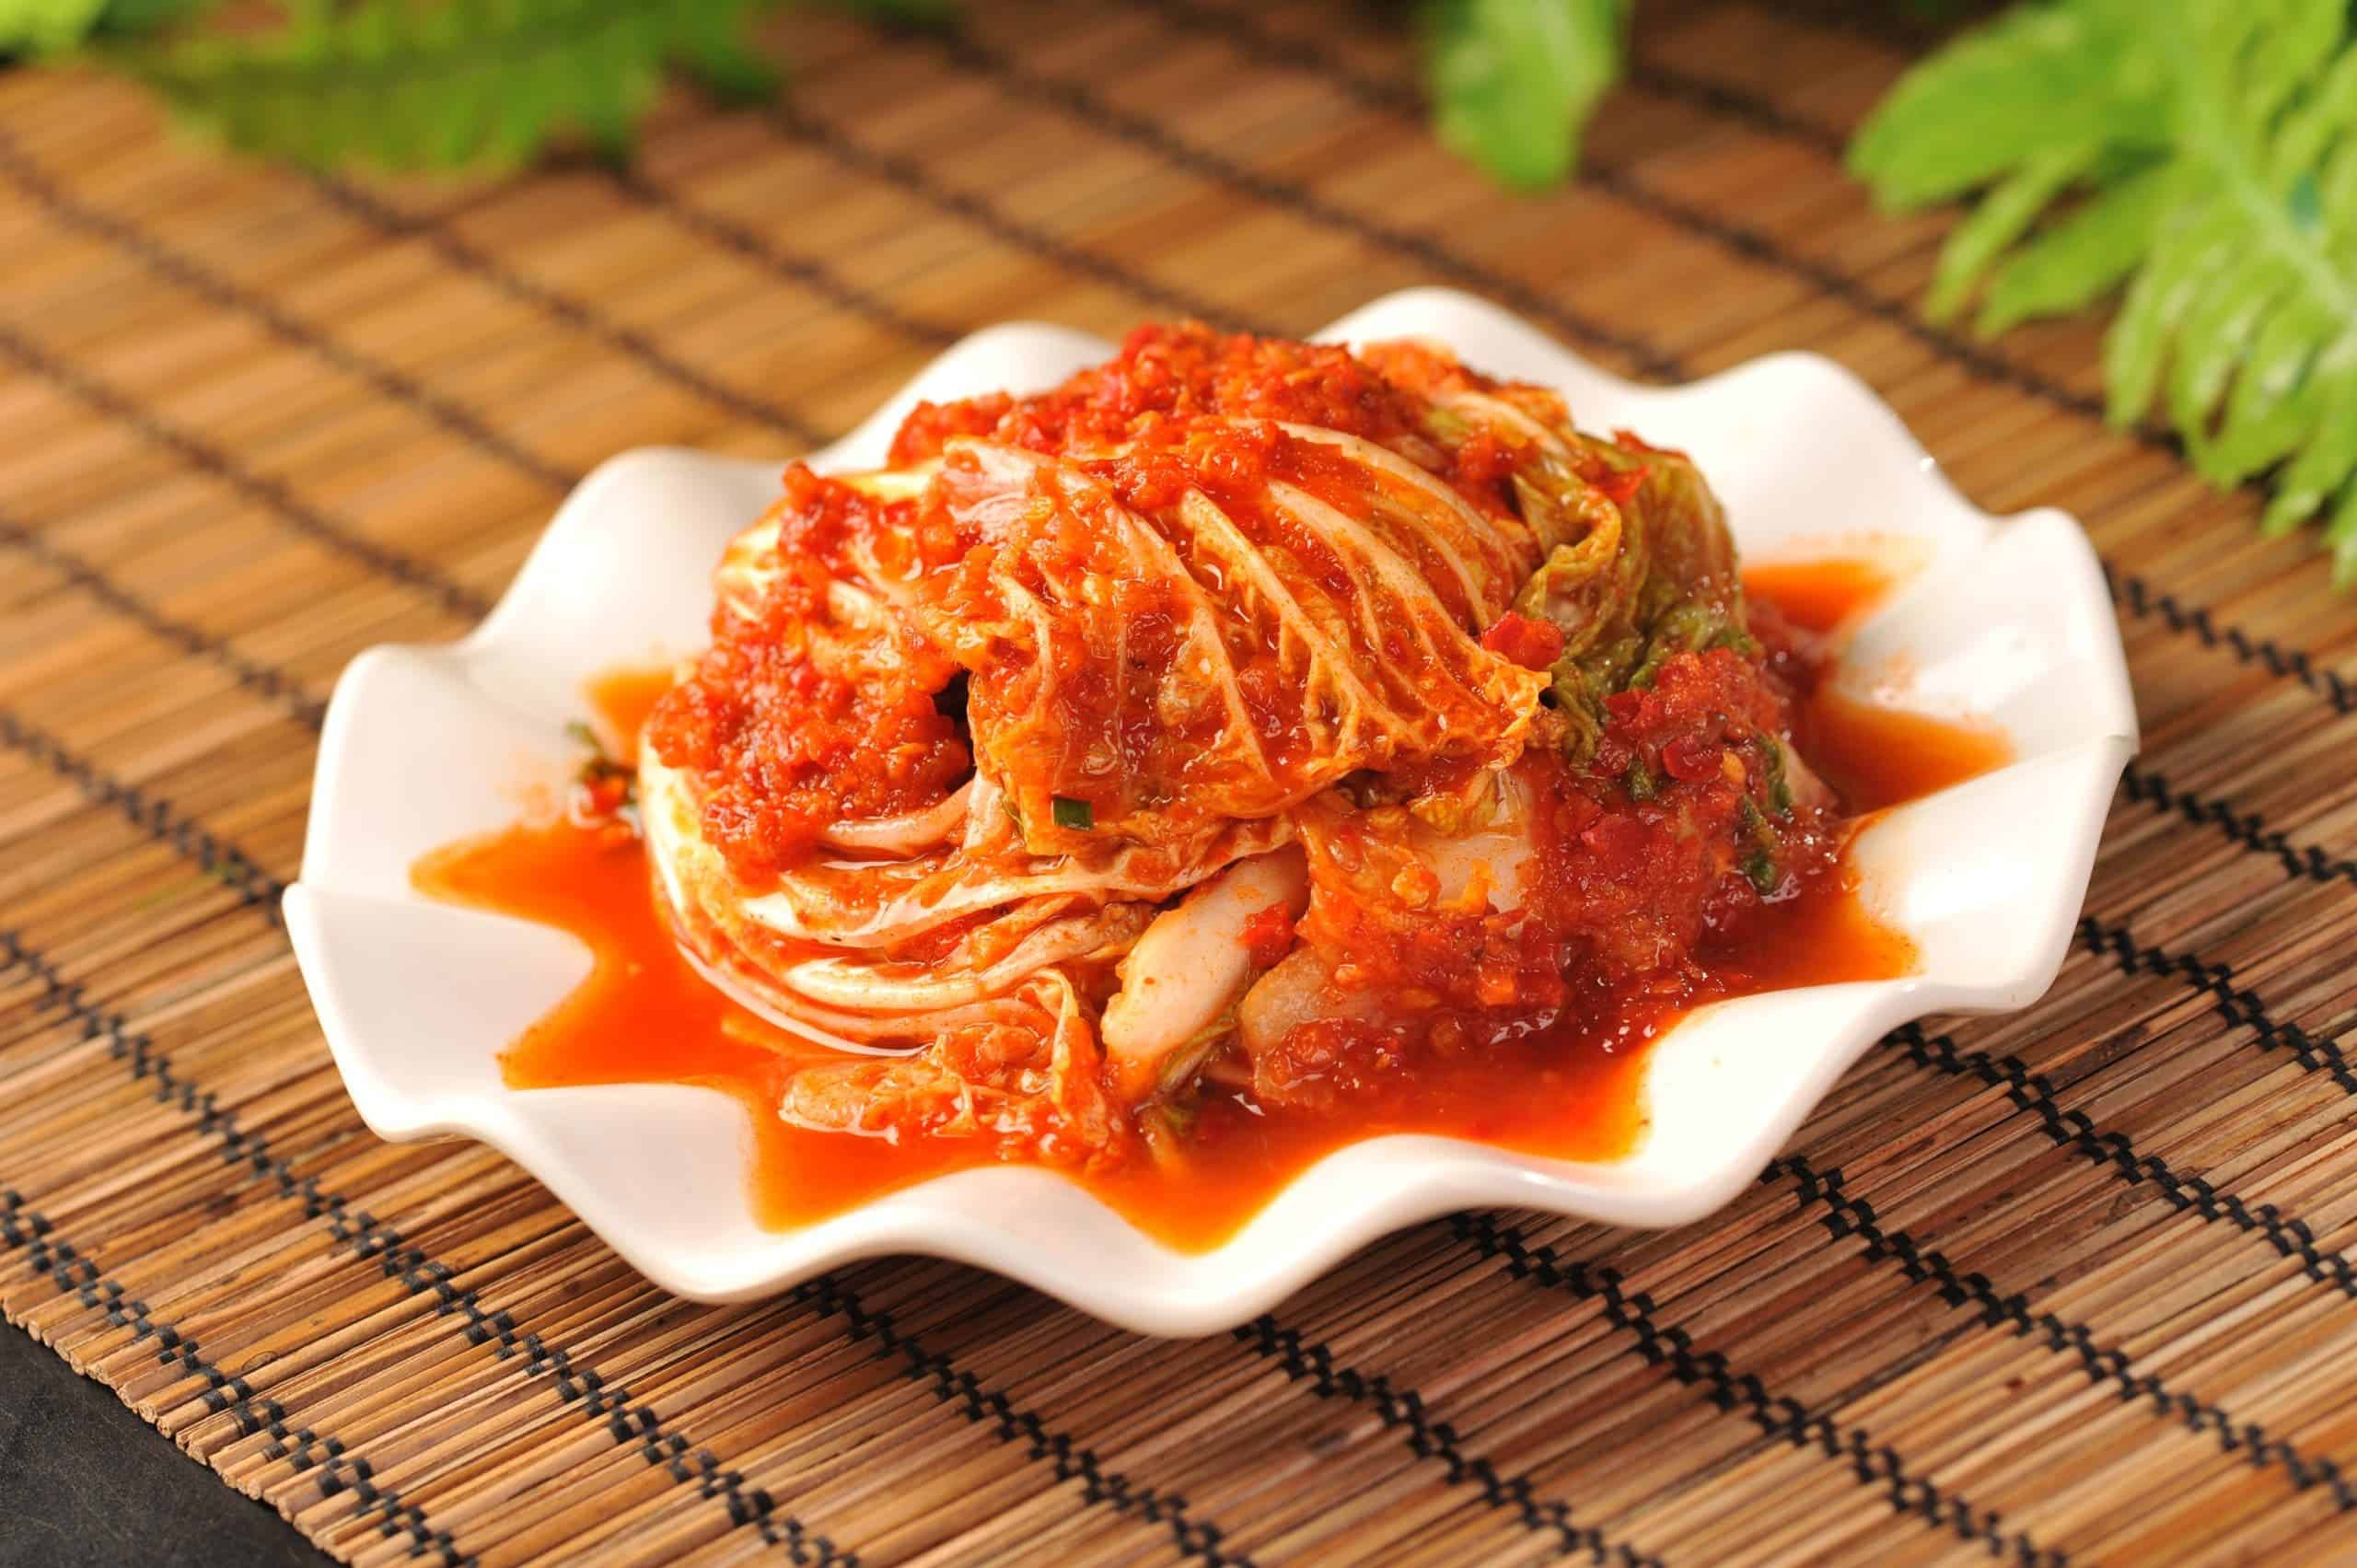 kimchi tradicional de corea